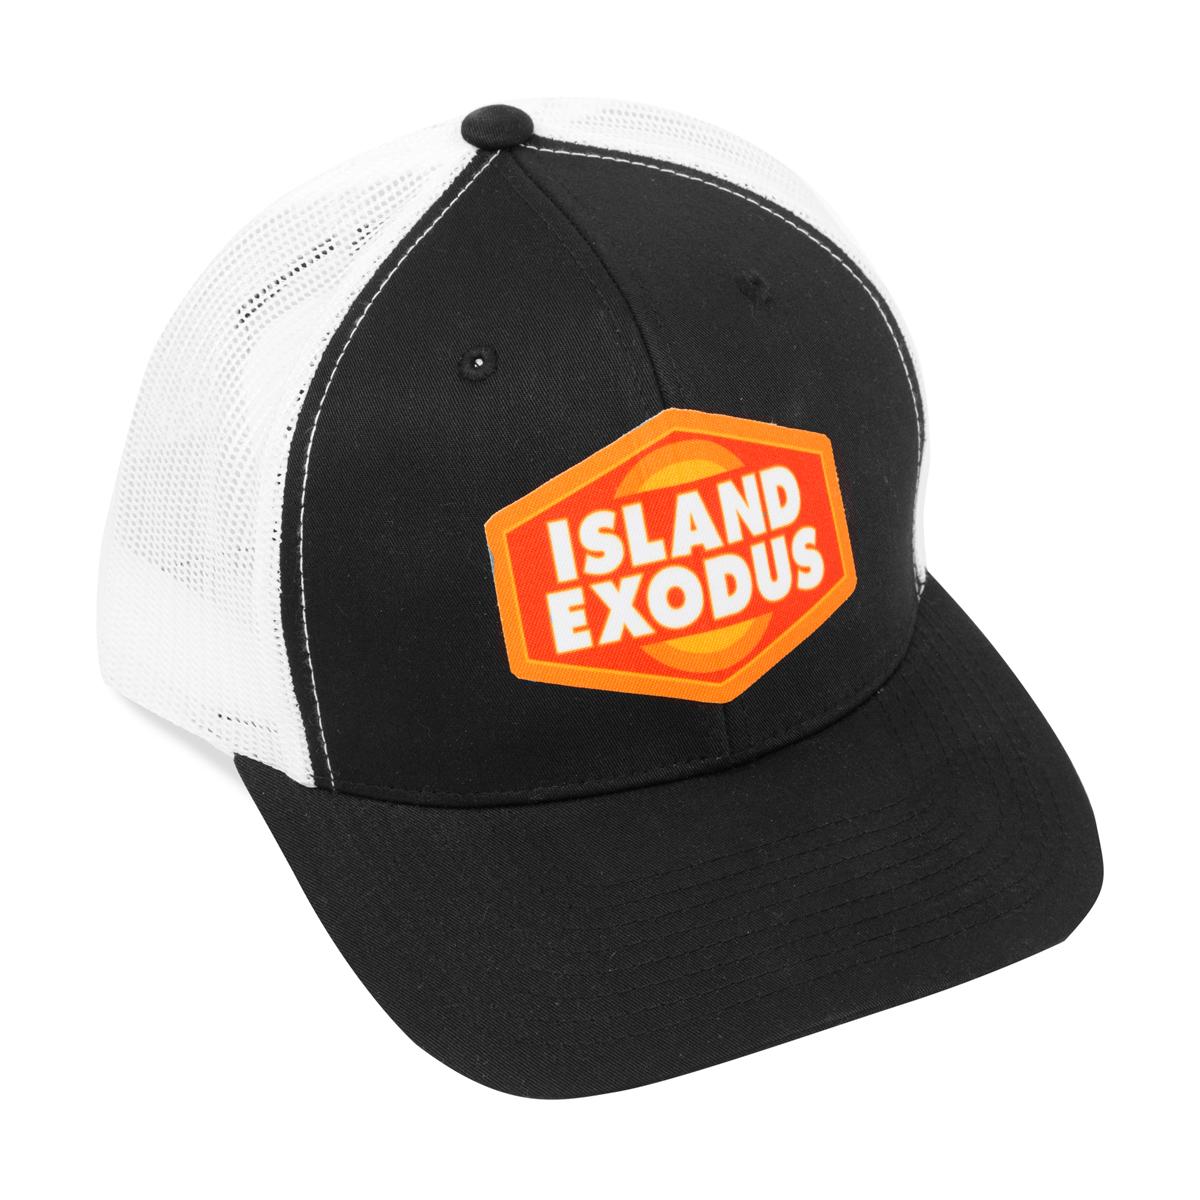 Island Exodus 2018 Hat